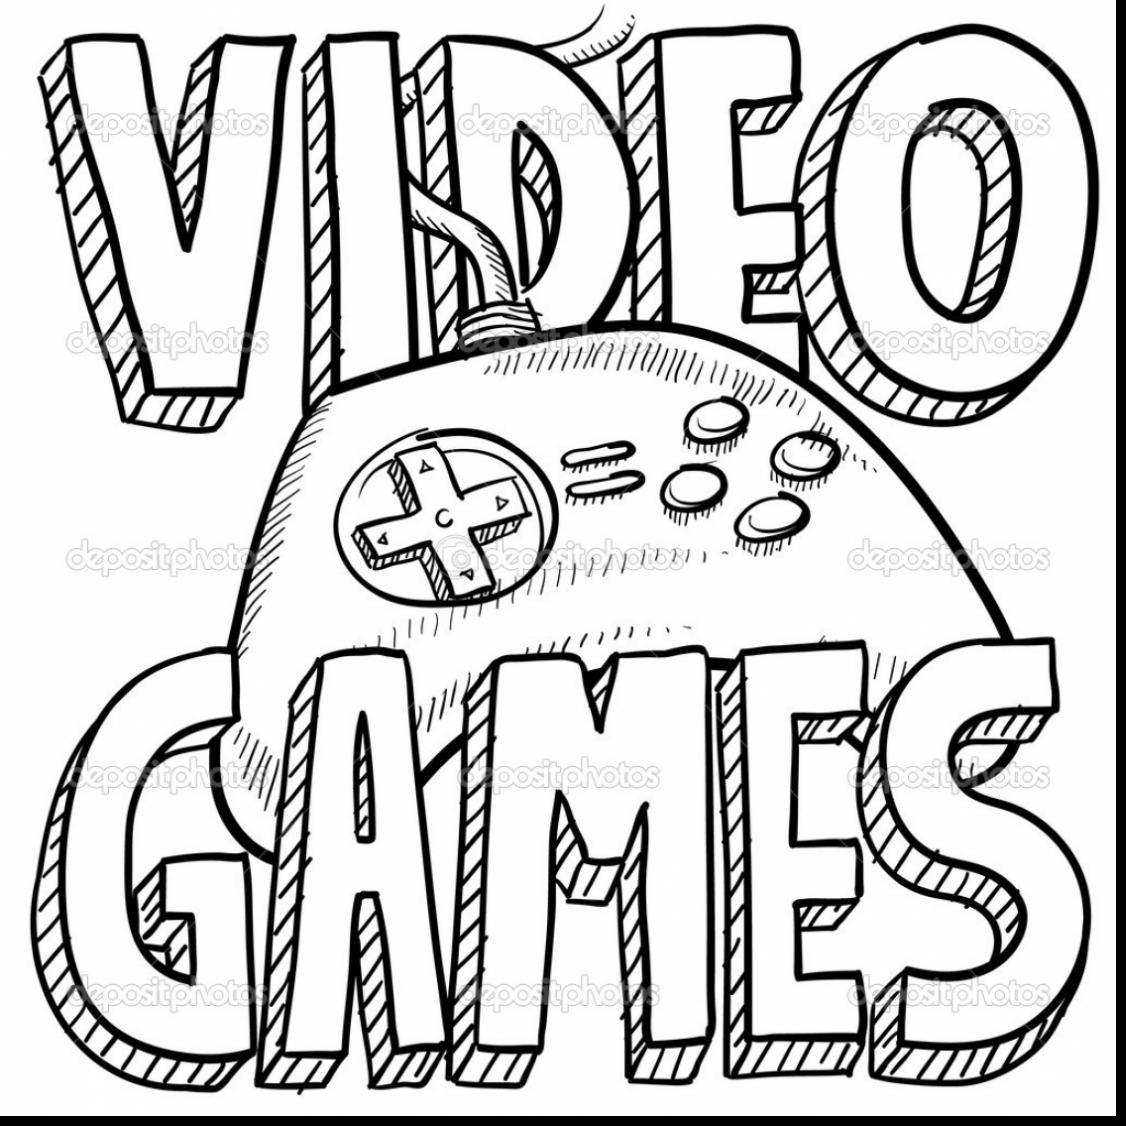 Video Game coloring #19, Download drawings